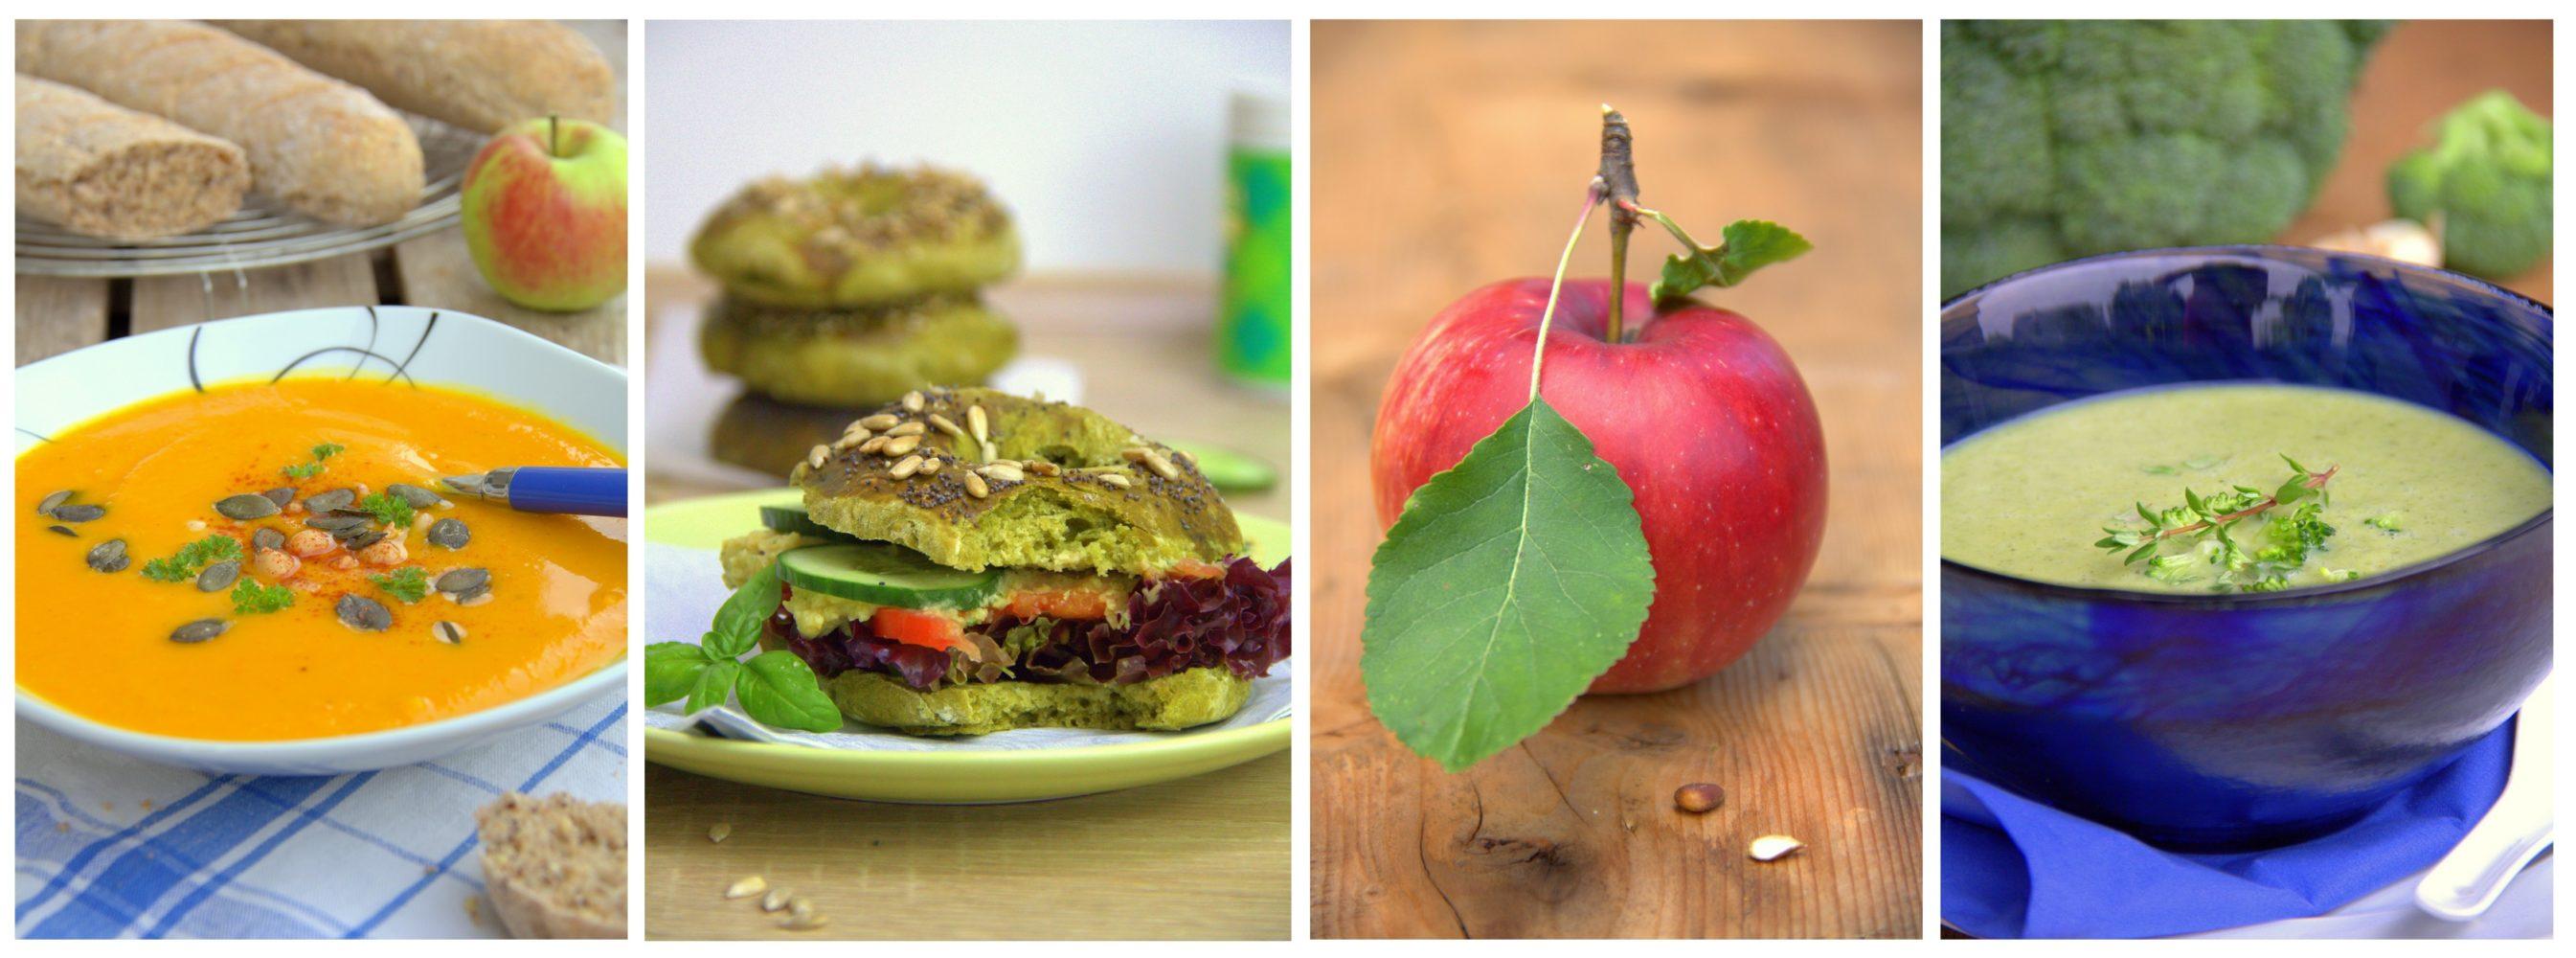 snackssuppen Suppen Snacks Inspiration vegane Rezepte gesund